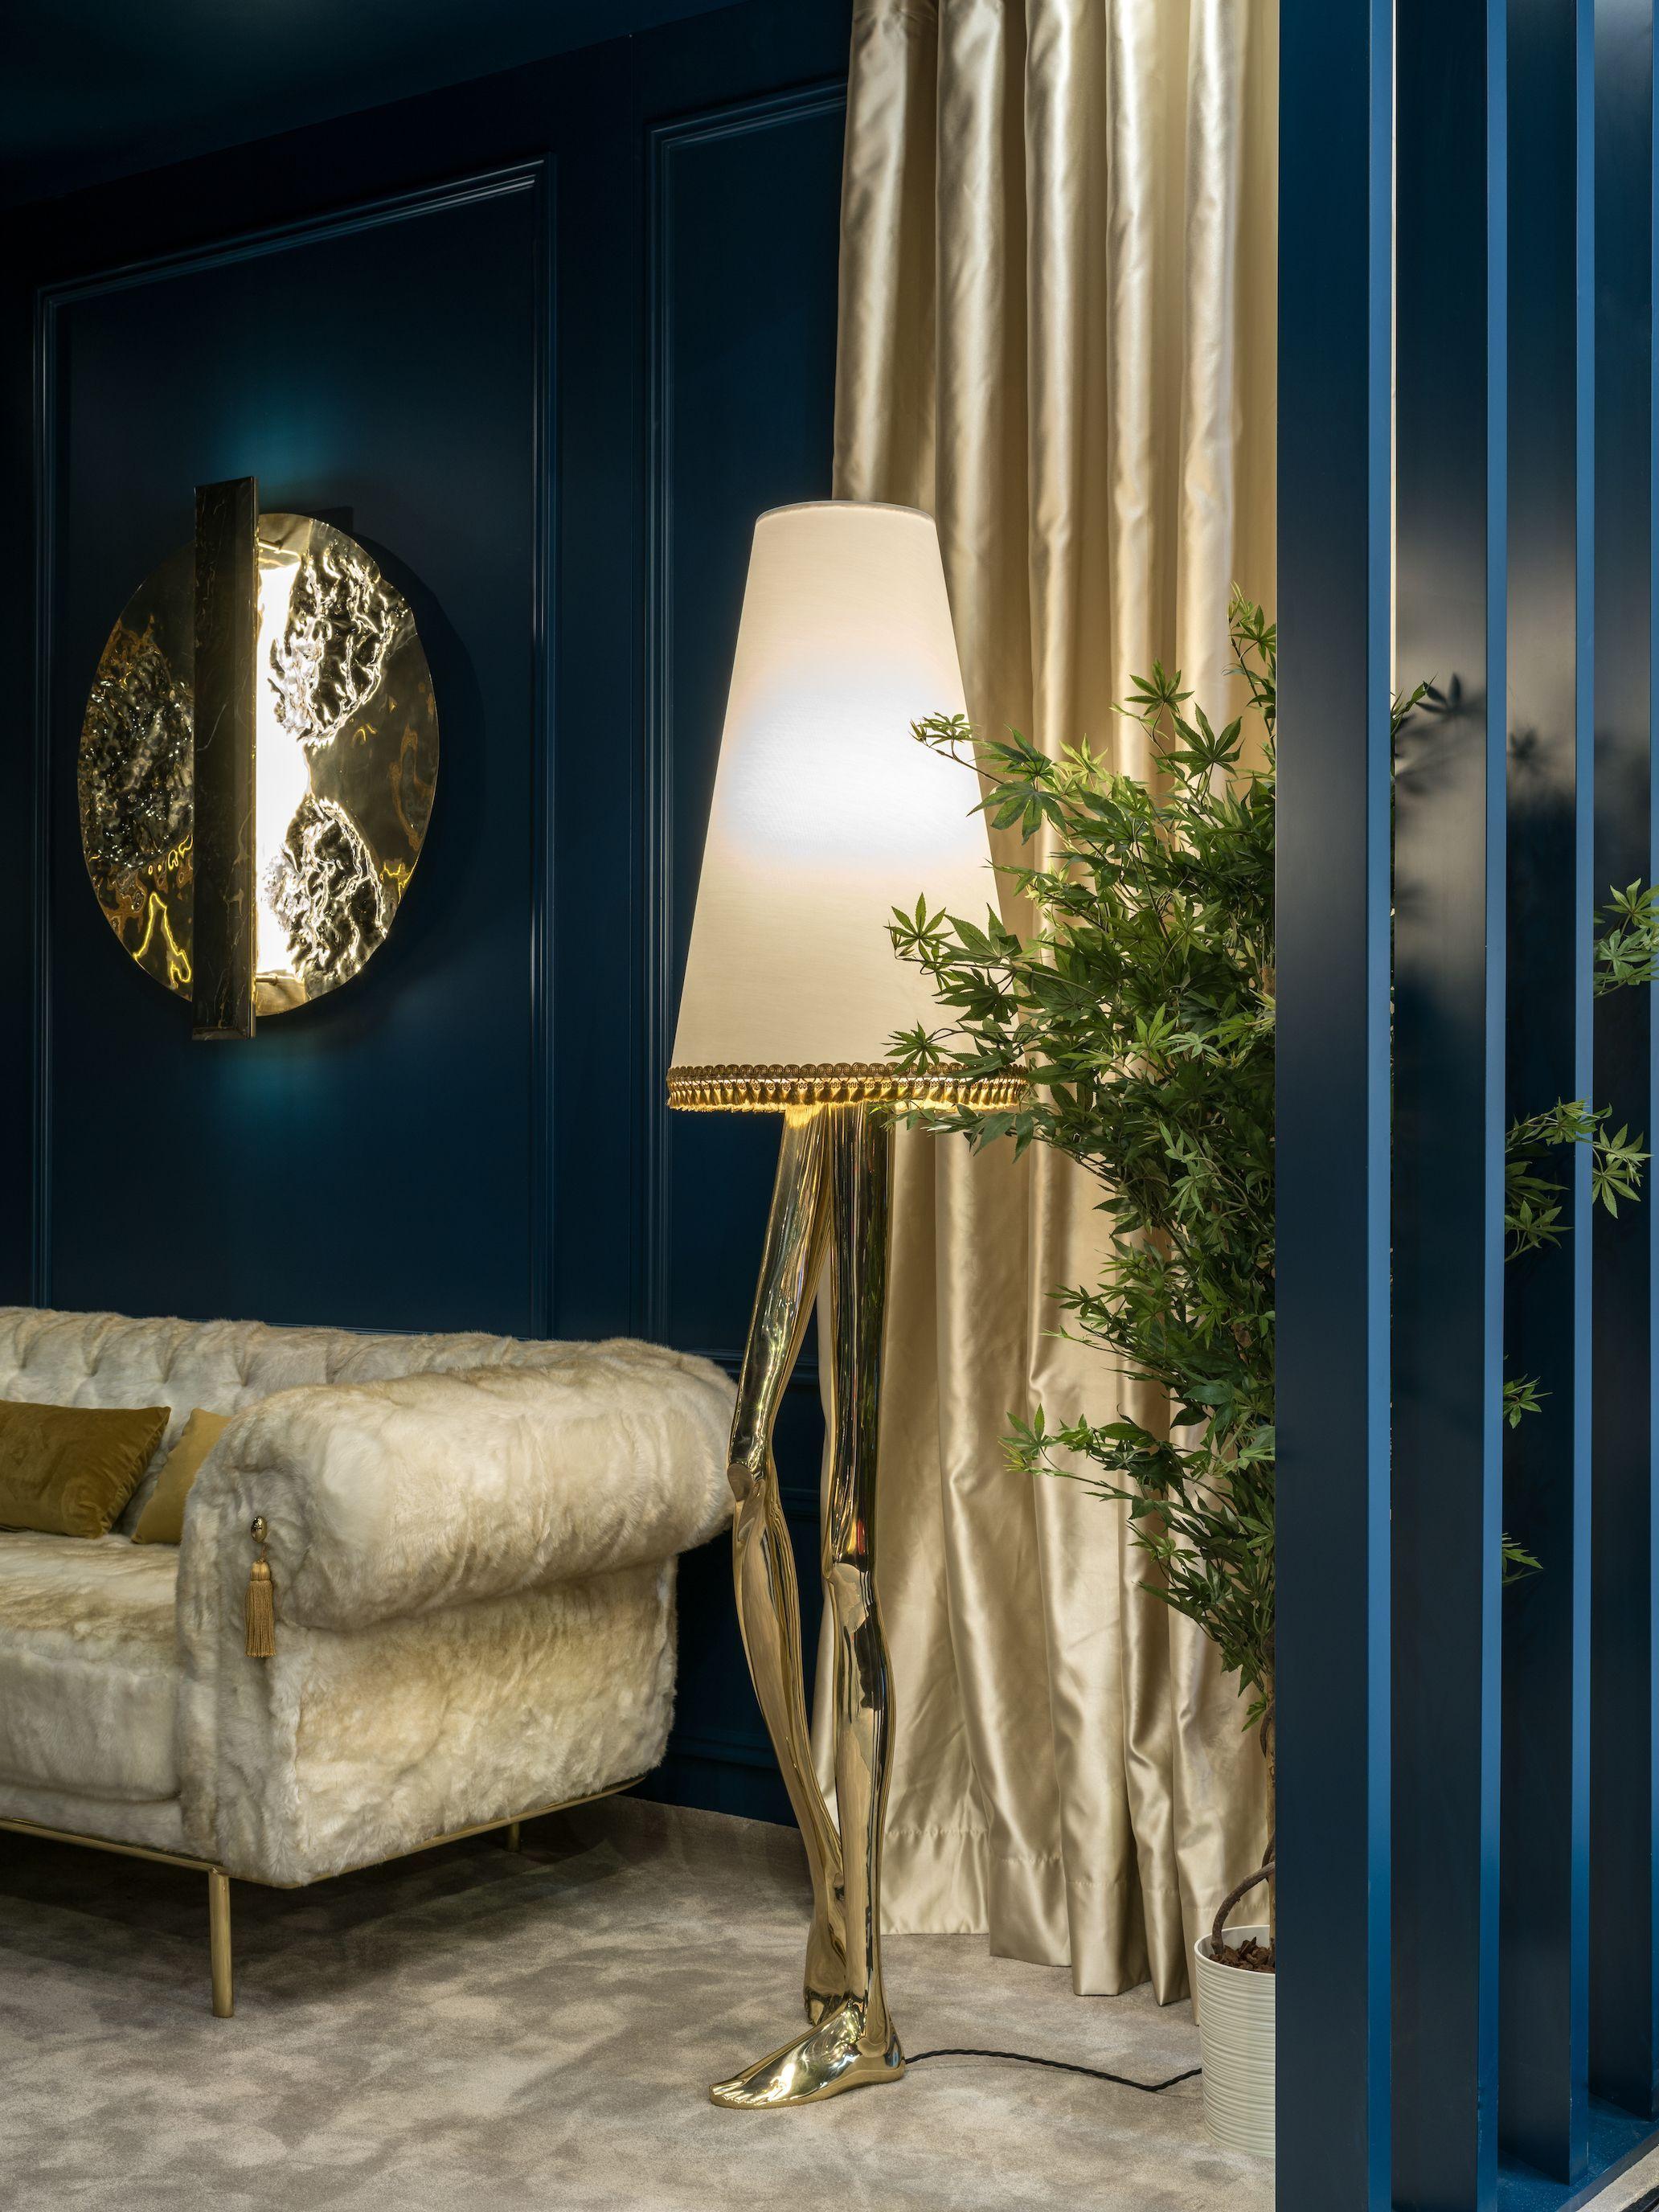 Home Decoration Allows You To Create Luxury Yet Modern Interior Design Projects Discover More Luxurious Interior Design Deta Maison Et Objet Decoration Maison